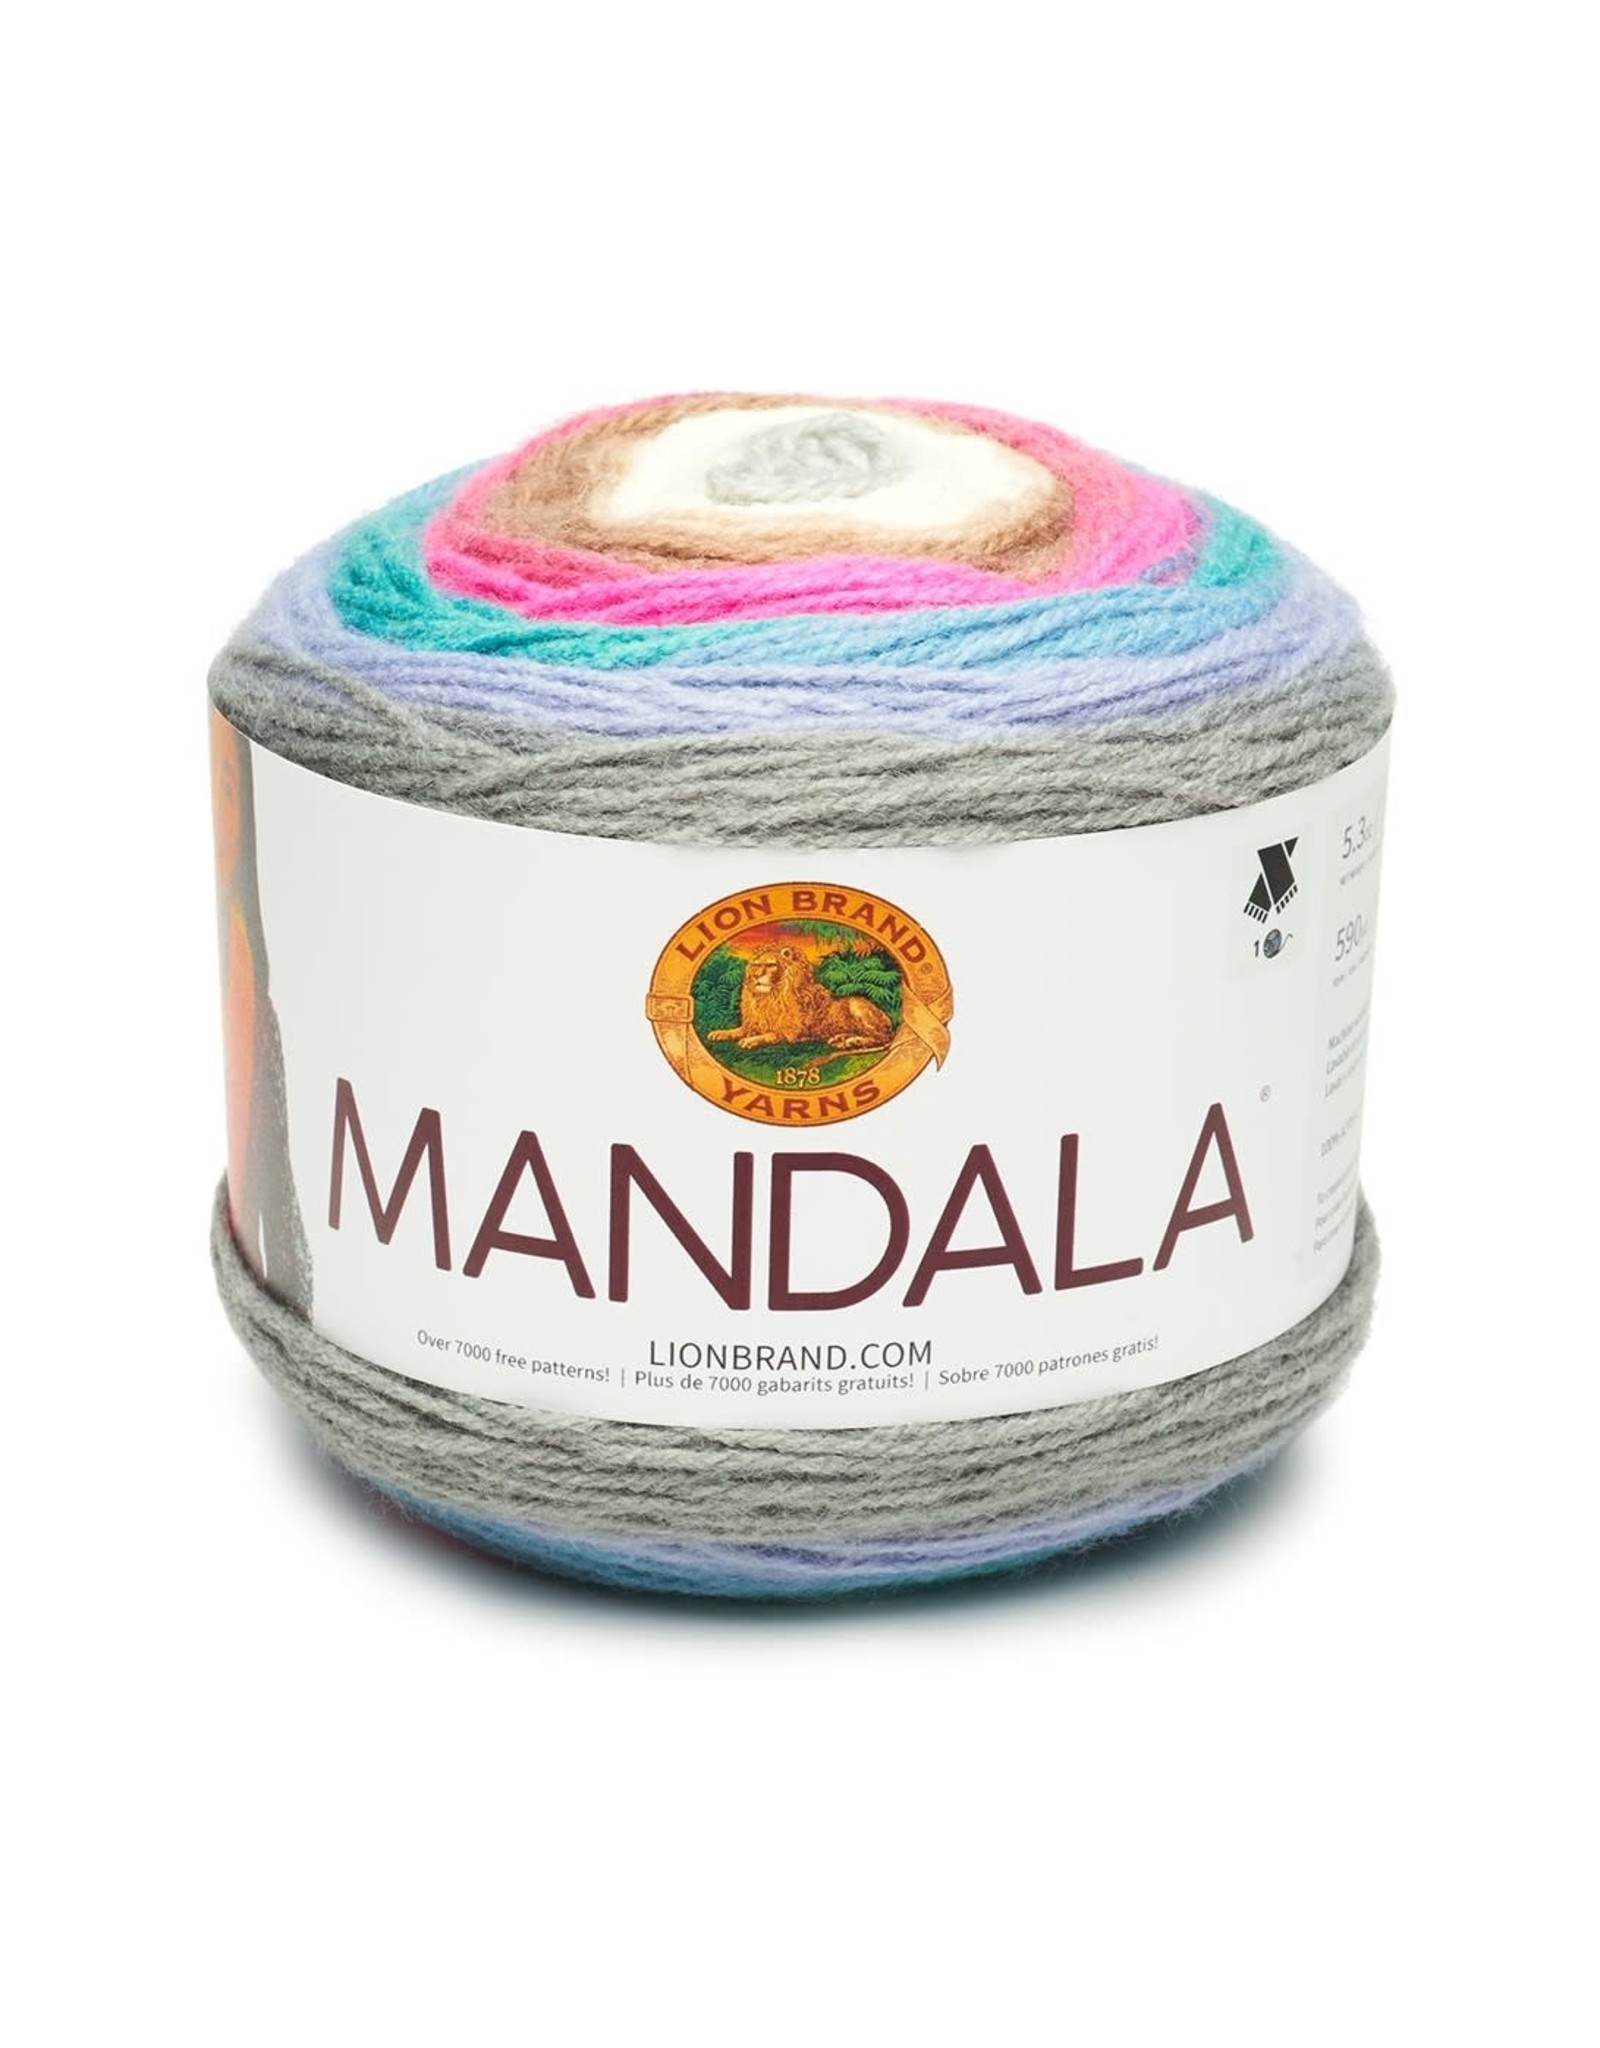 Fairy - Mandala - Lion Brand